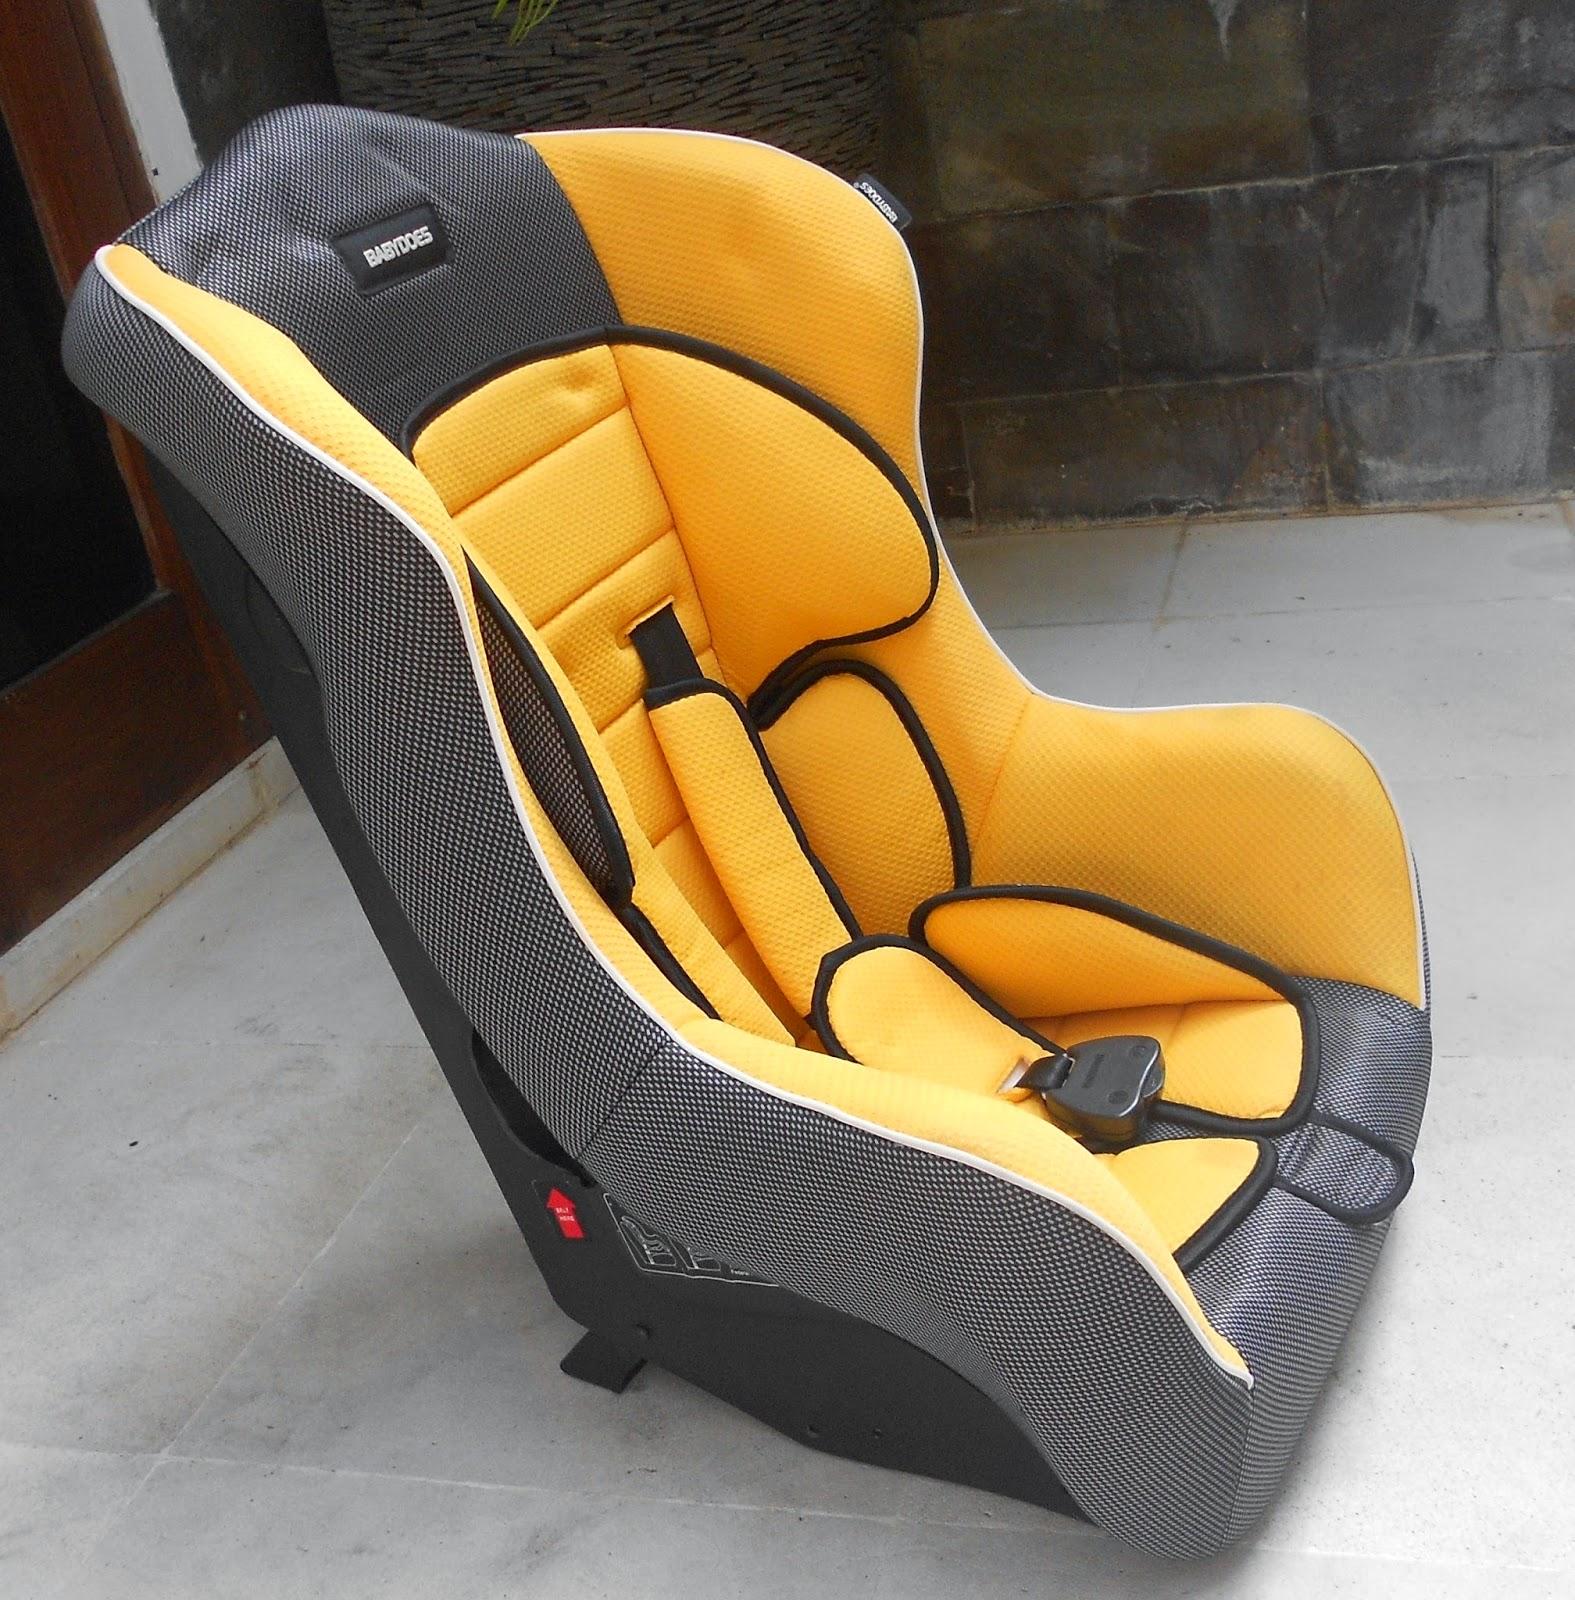 Sedan Chair Rental Home Depot Plastic Chairs Eve Baby Care Bali Car Seat